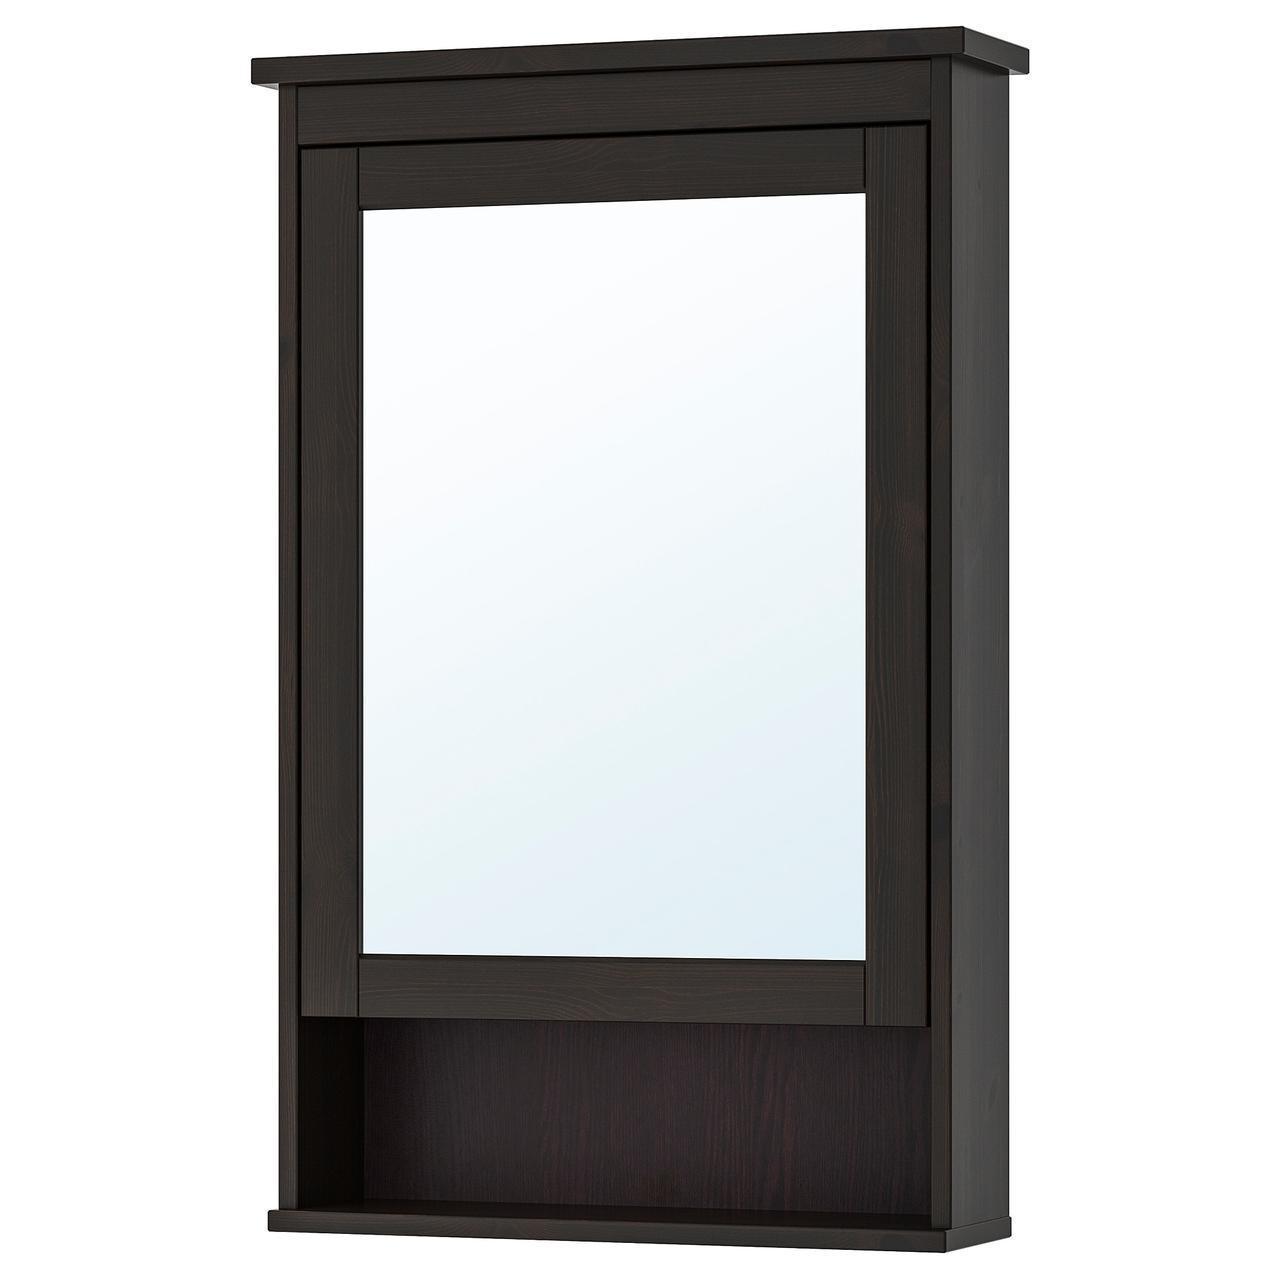 IKEA HEMNES Шкаф с зеркалом и дверью, черно-коричневая Морилка  (302.176.73)